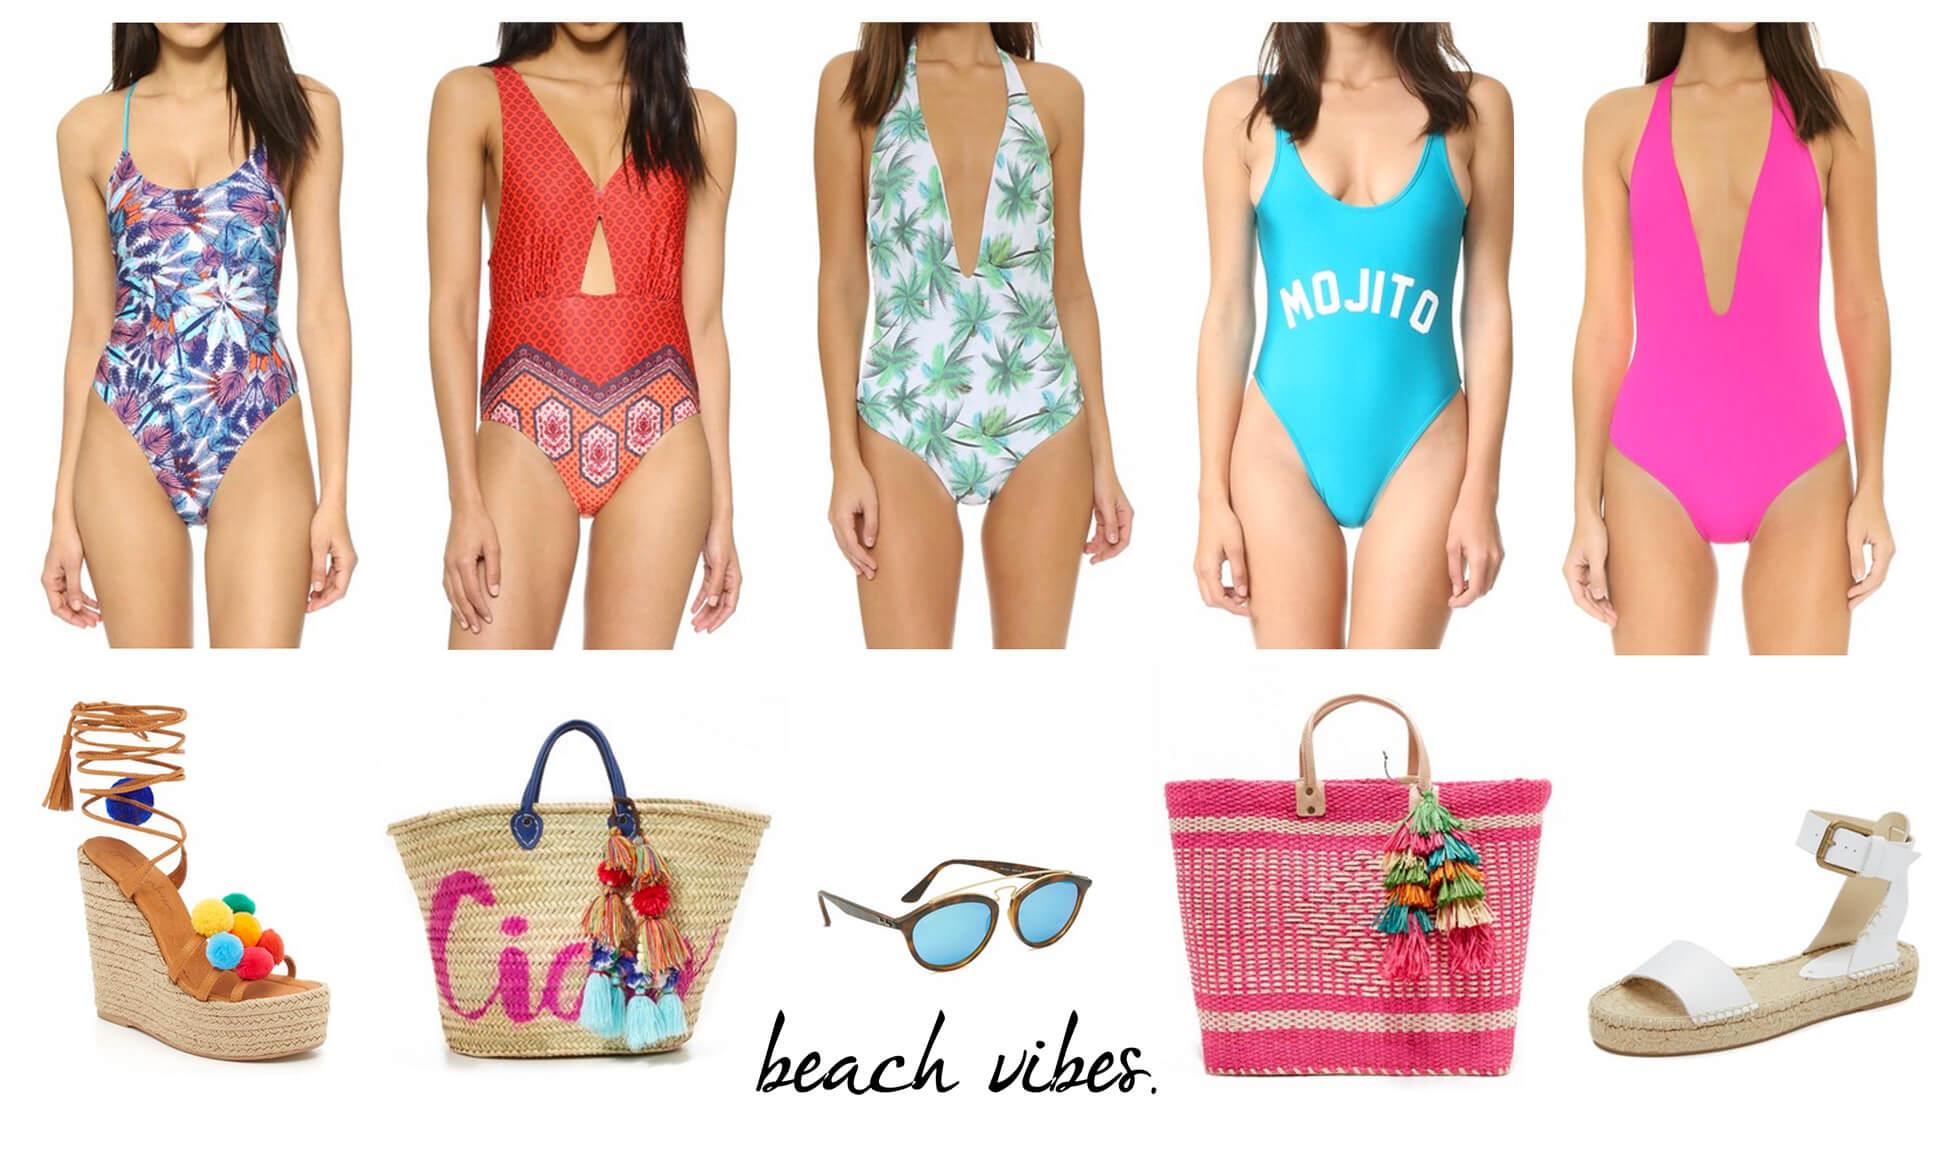 janni-deler-beach-favorite-pieces